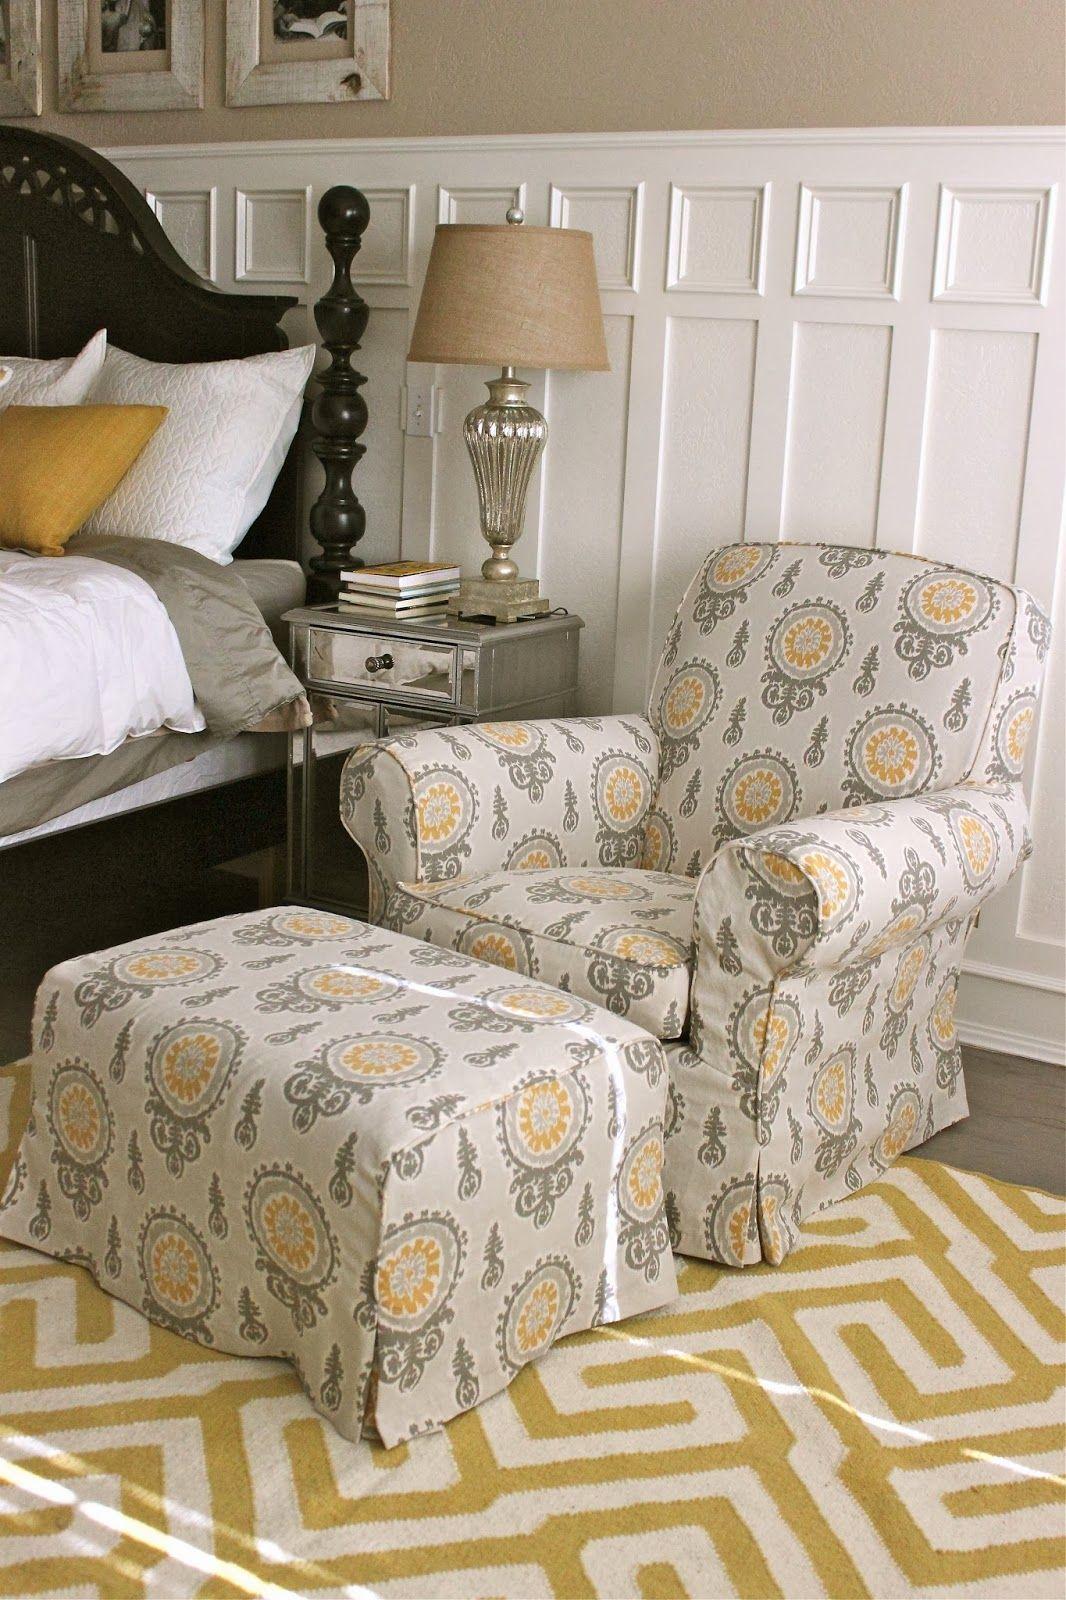 bedroom chair pinterest cypress adirondack chairs louisiana custom slipcovers by shelley gray yellow